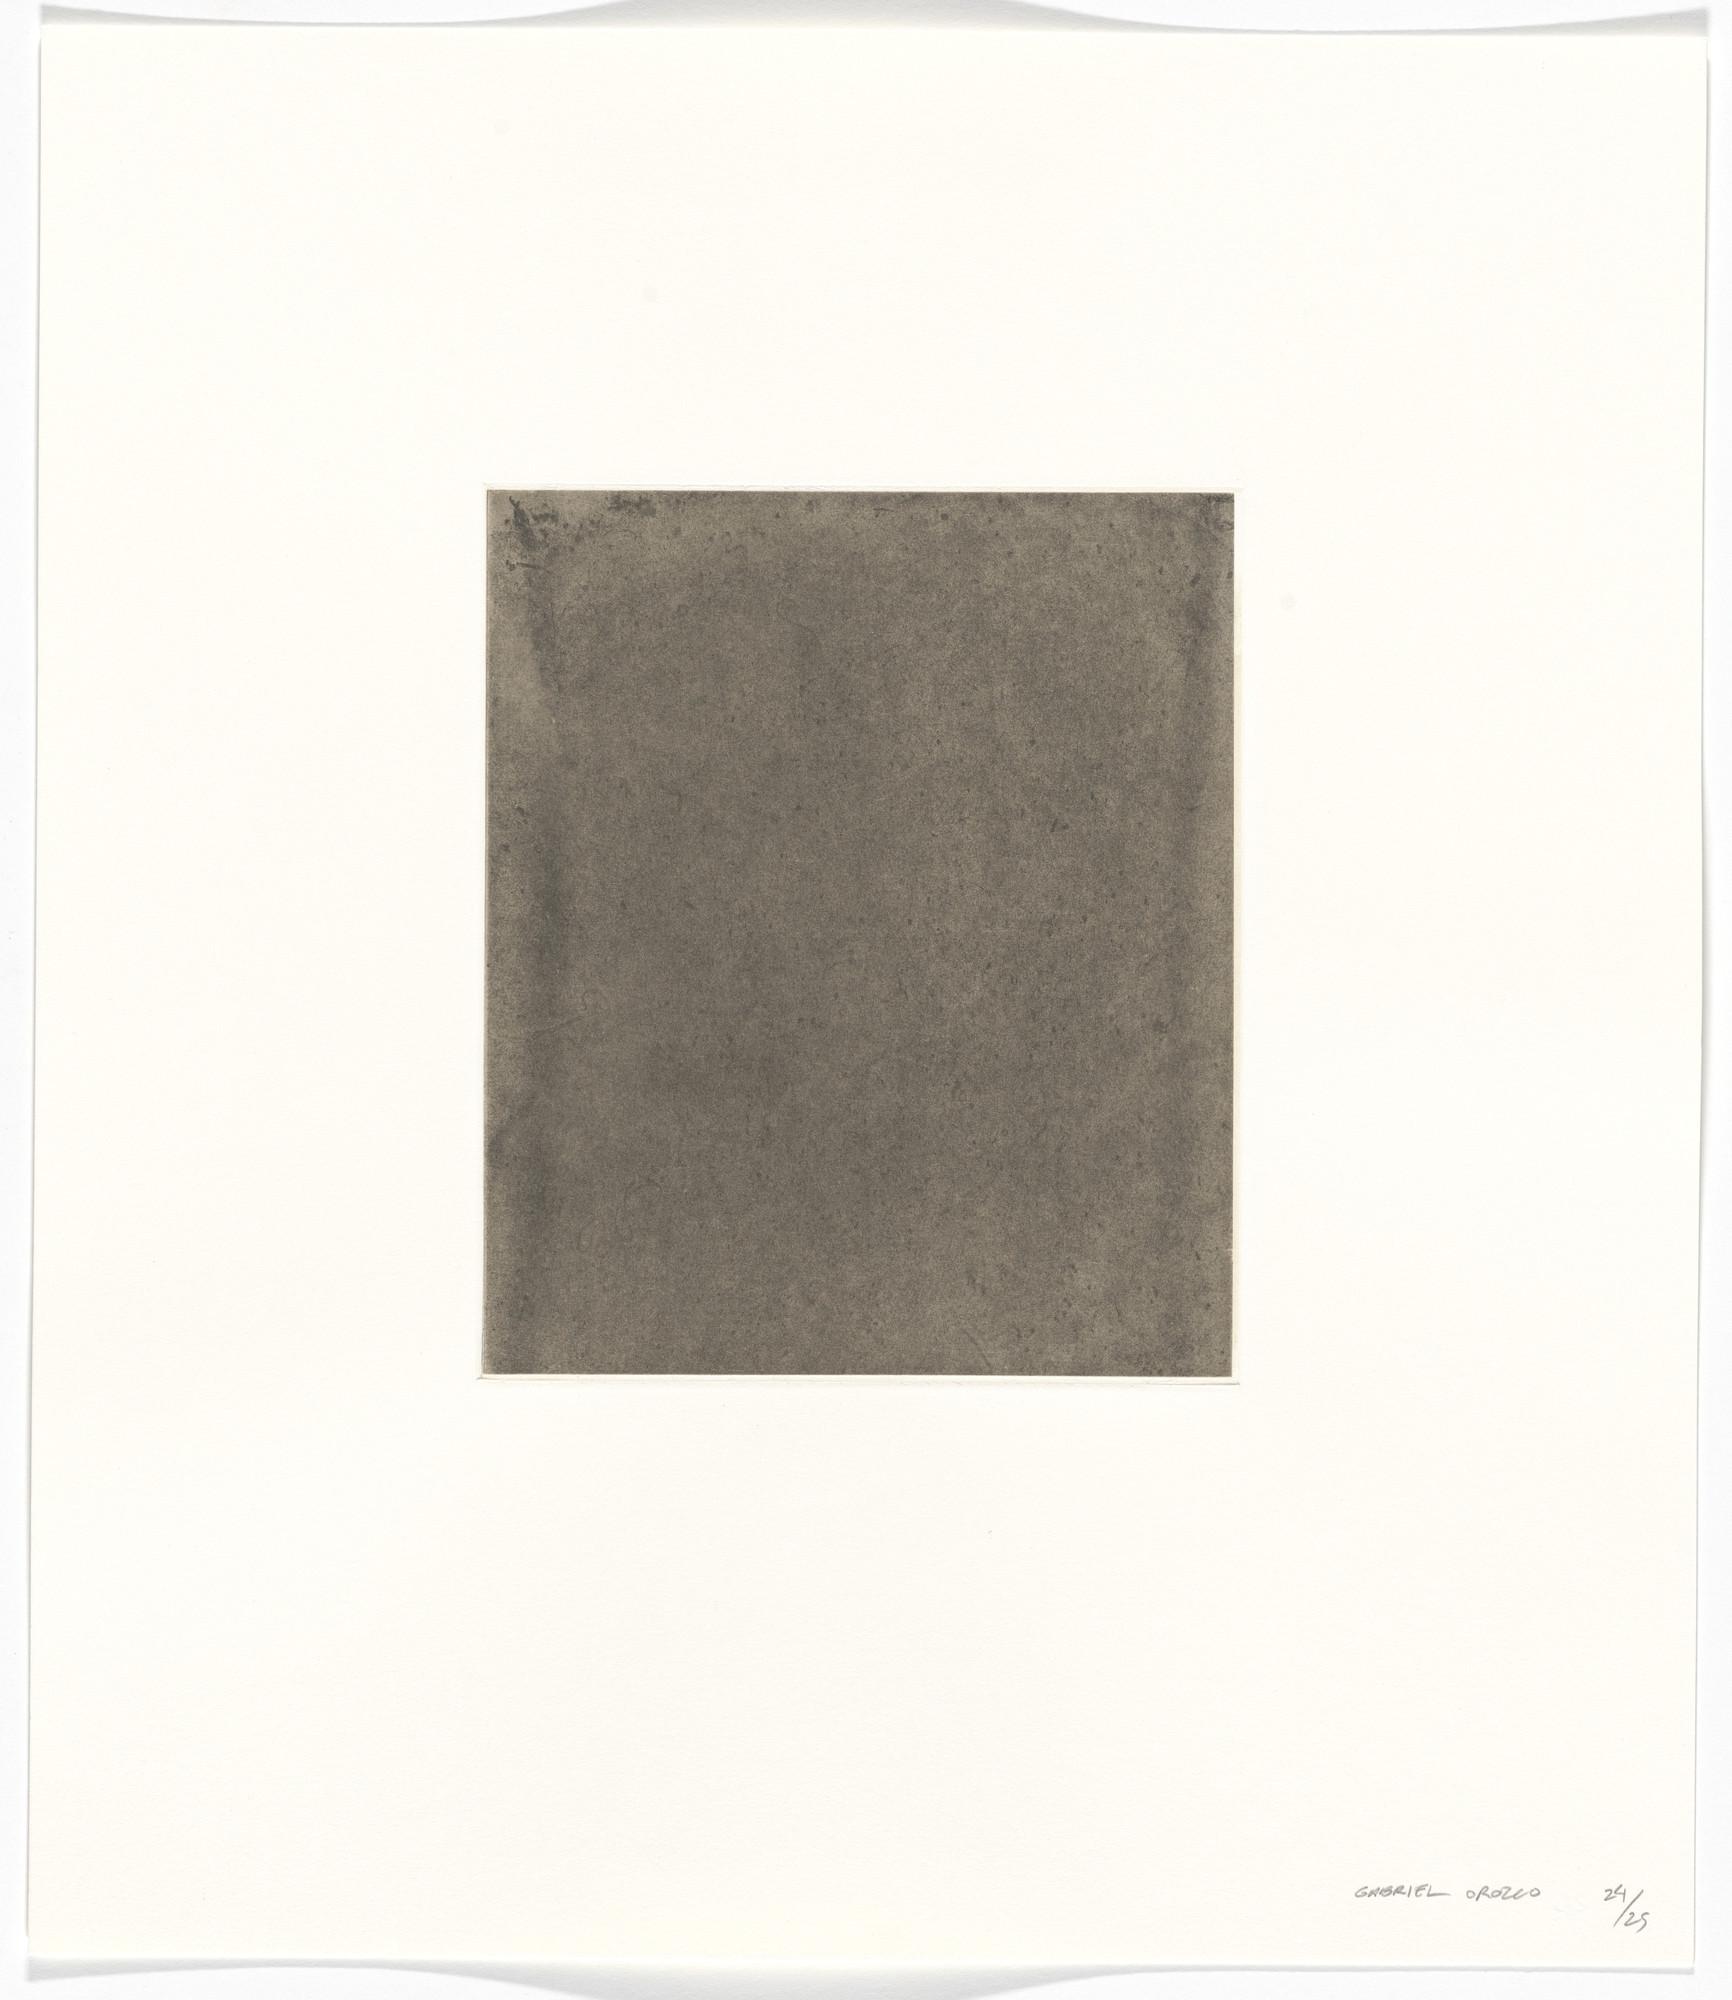 Gabriel Orozco. Untitled from Polvo Impreso (Lint Book). 2002 | MoMA